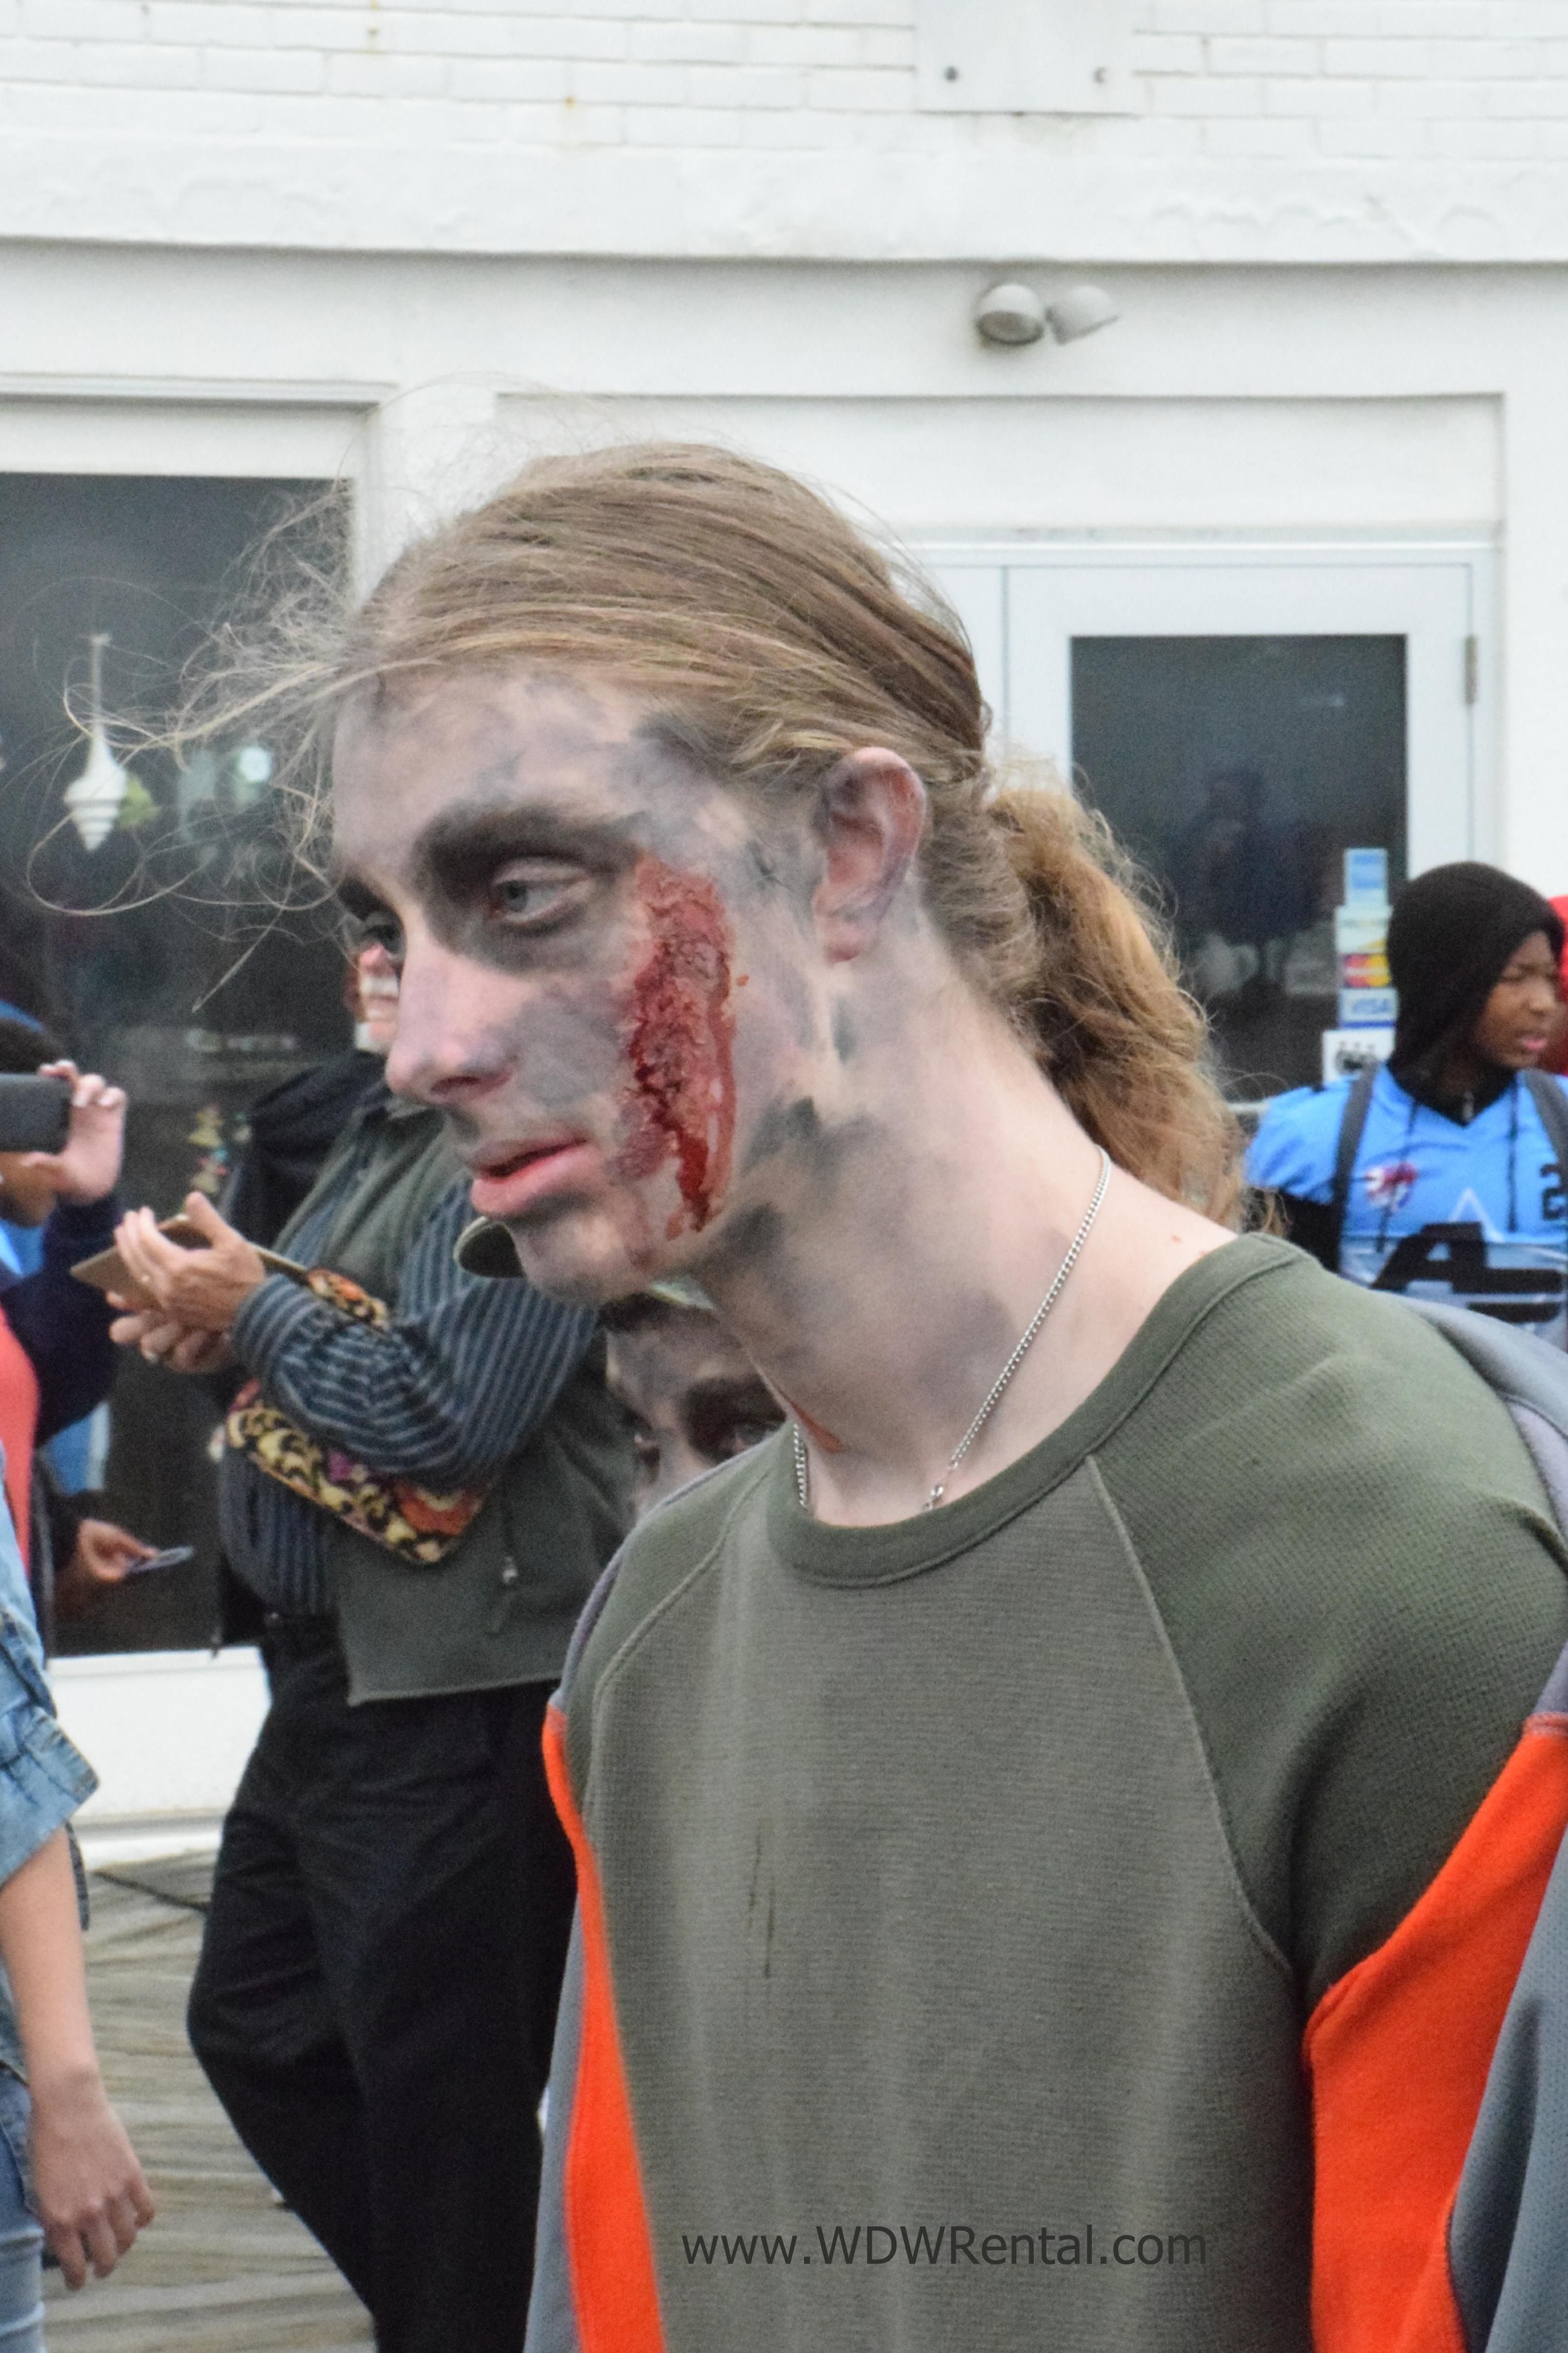 Asbury Park Zombie Walk 2016, Asbury Park Boardwalk